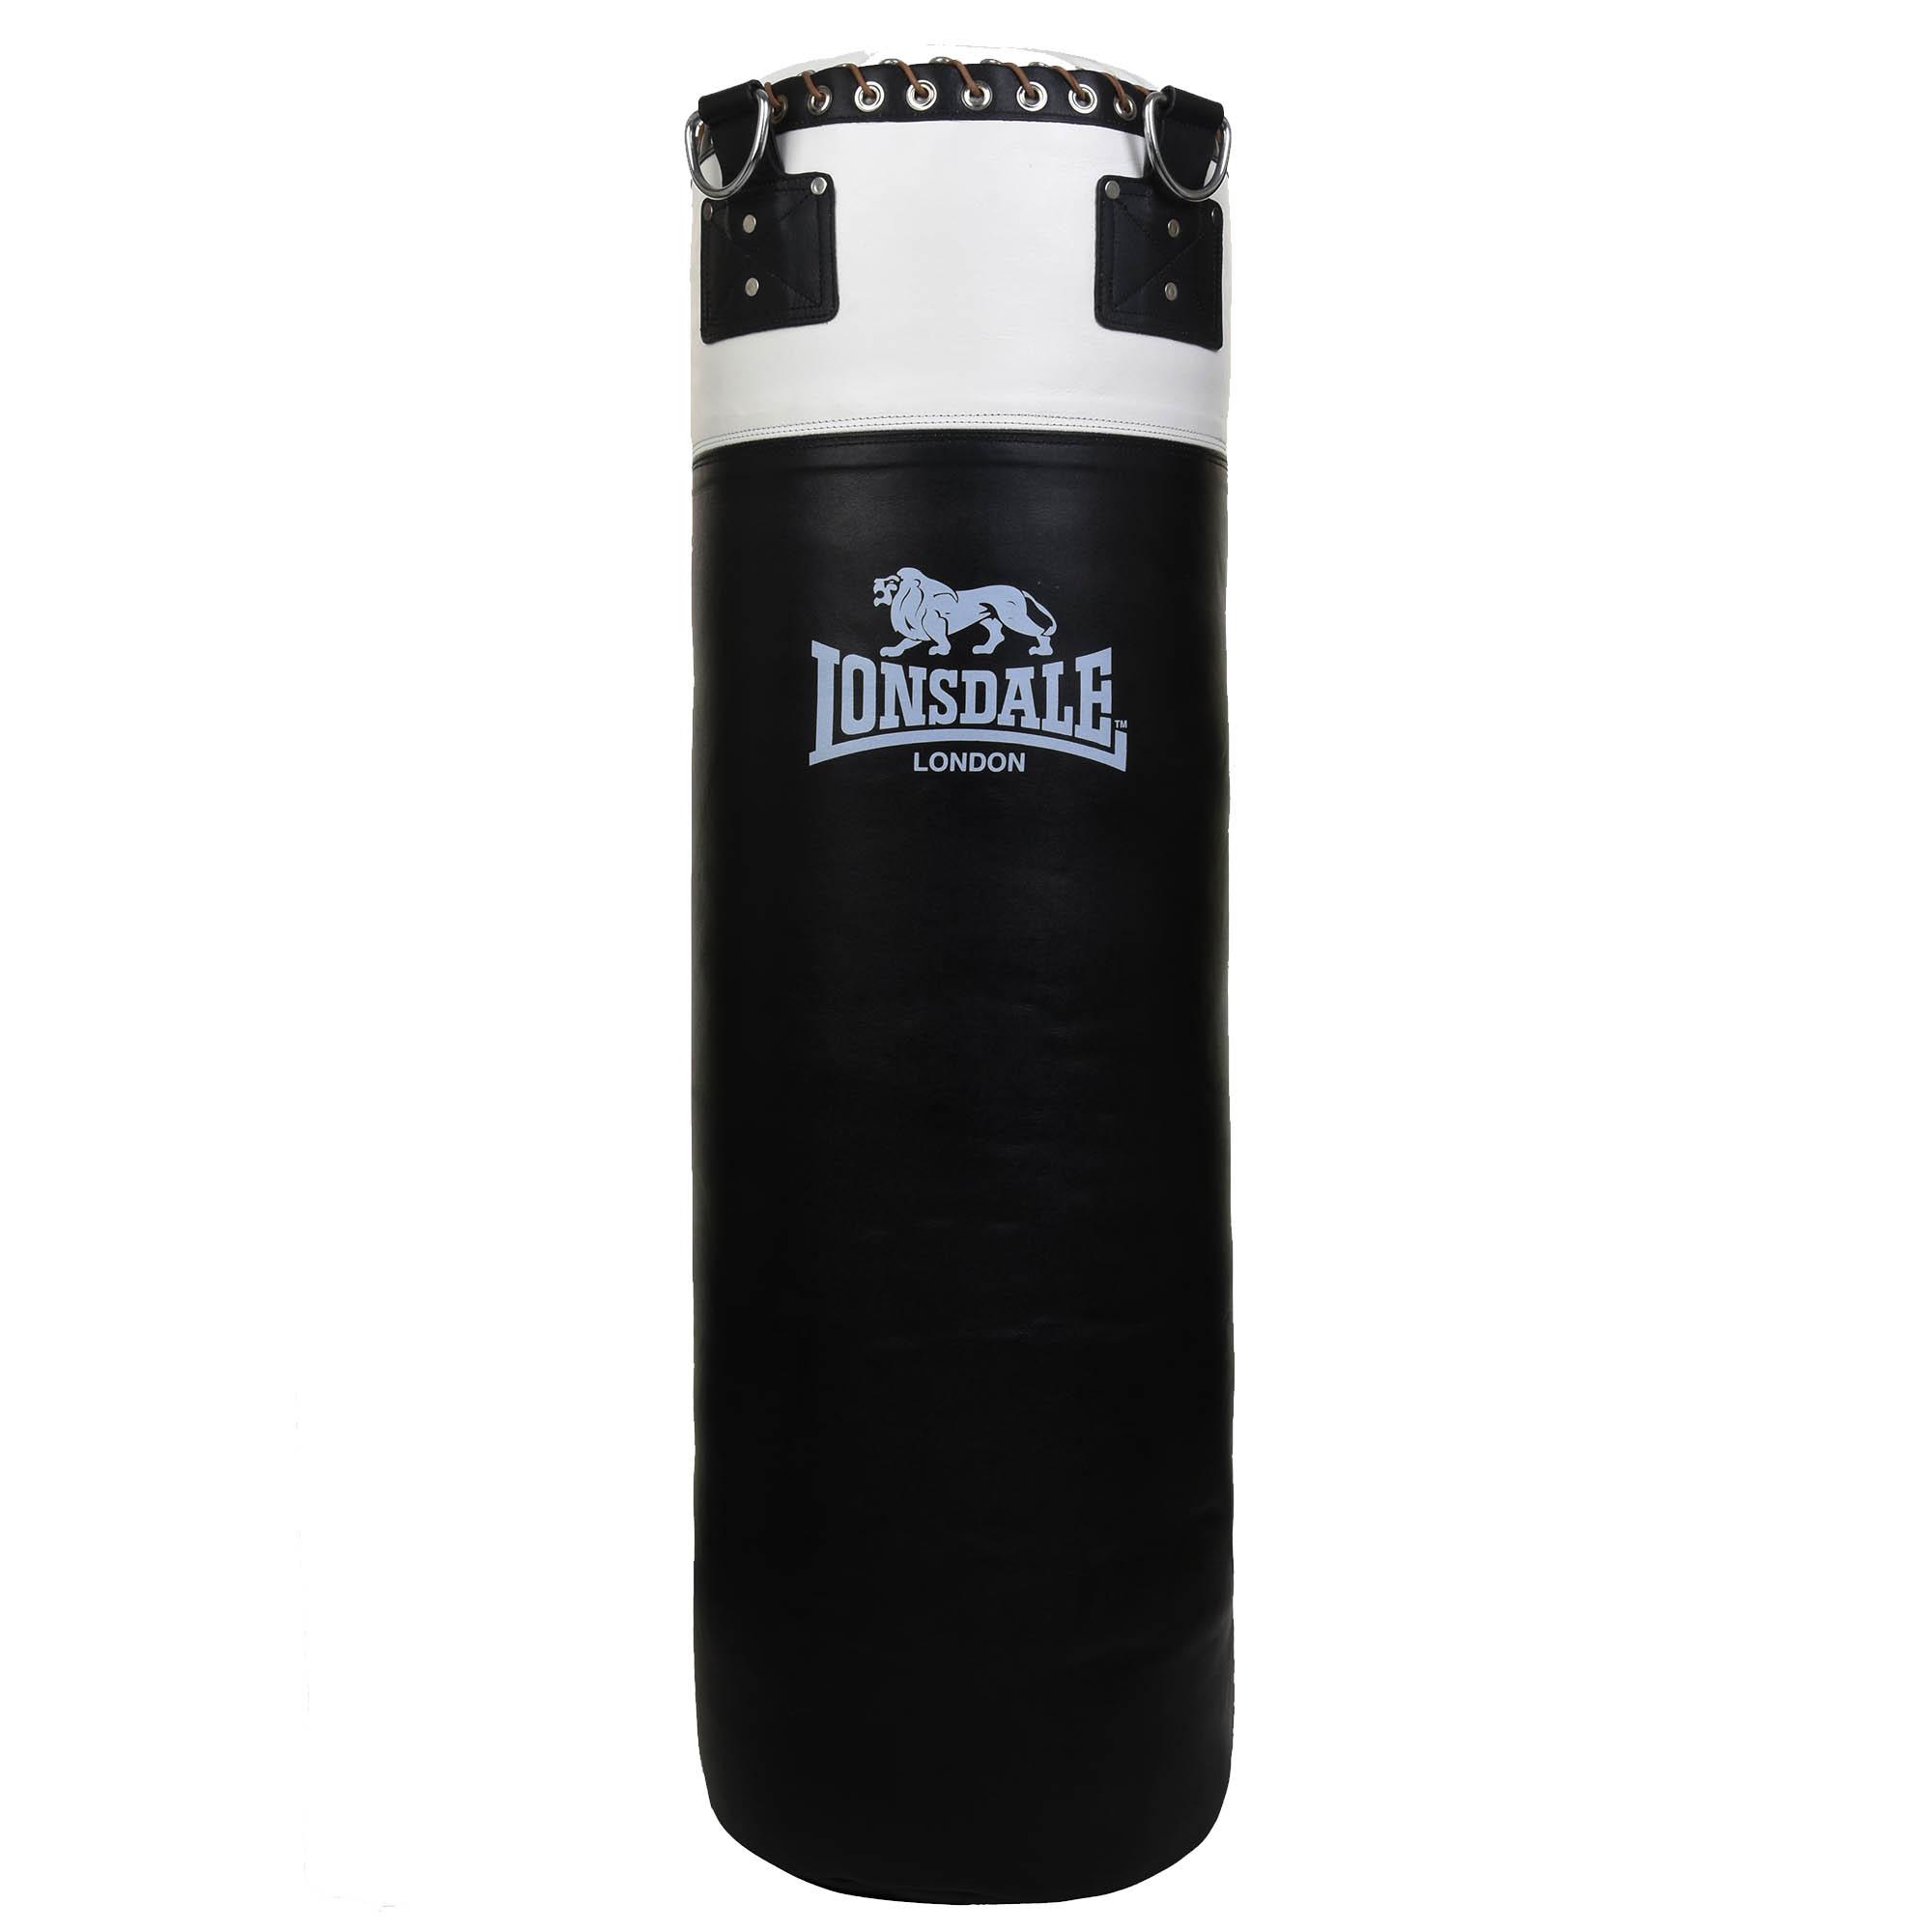 Lonsdale L60 3ft Leather Punch Bag – Black/White